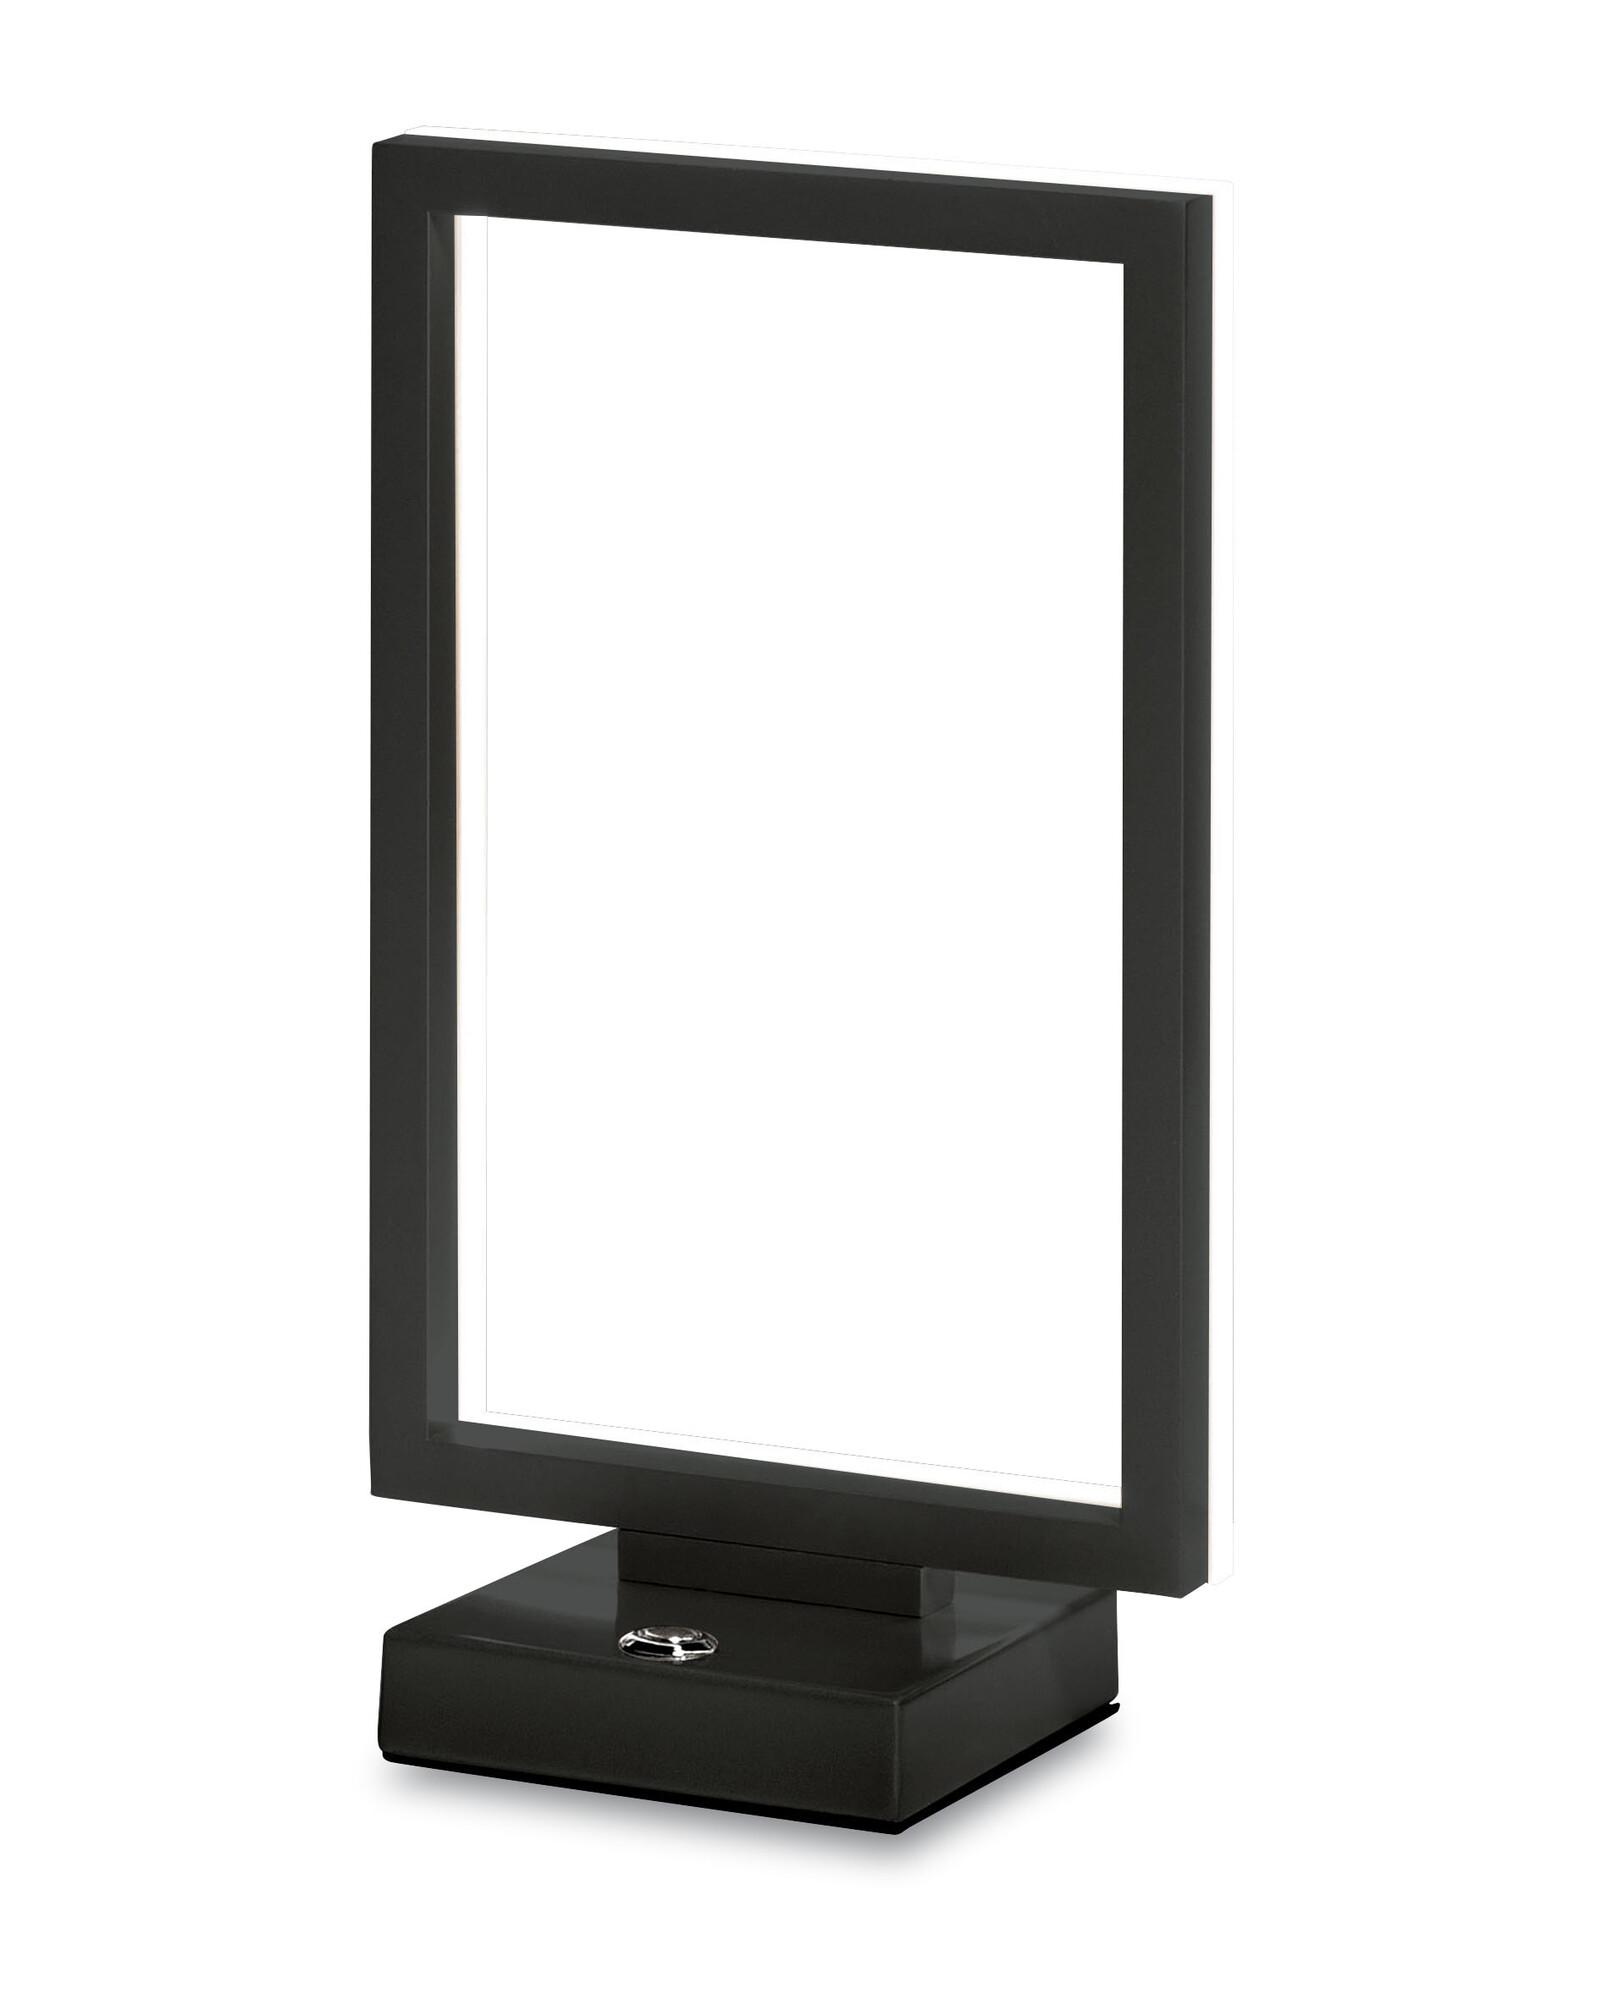 BARD Tafellamp LED 1x15W/1350lm Antraciet